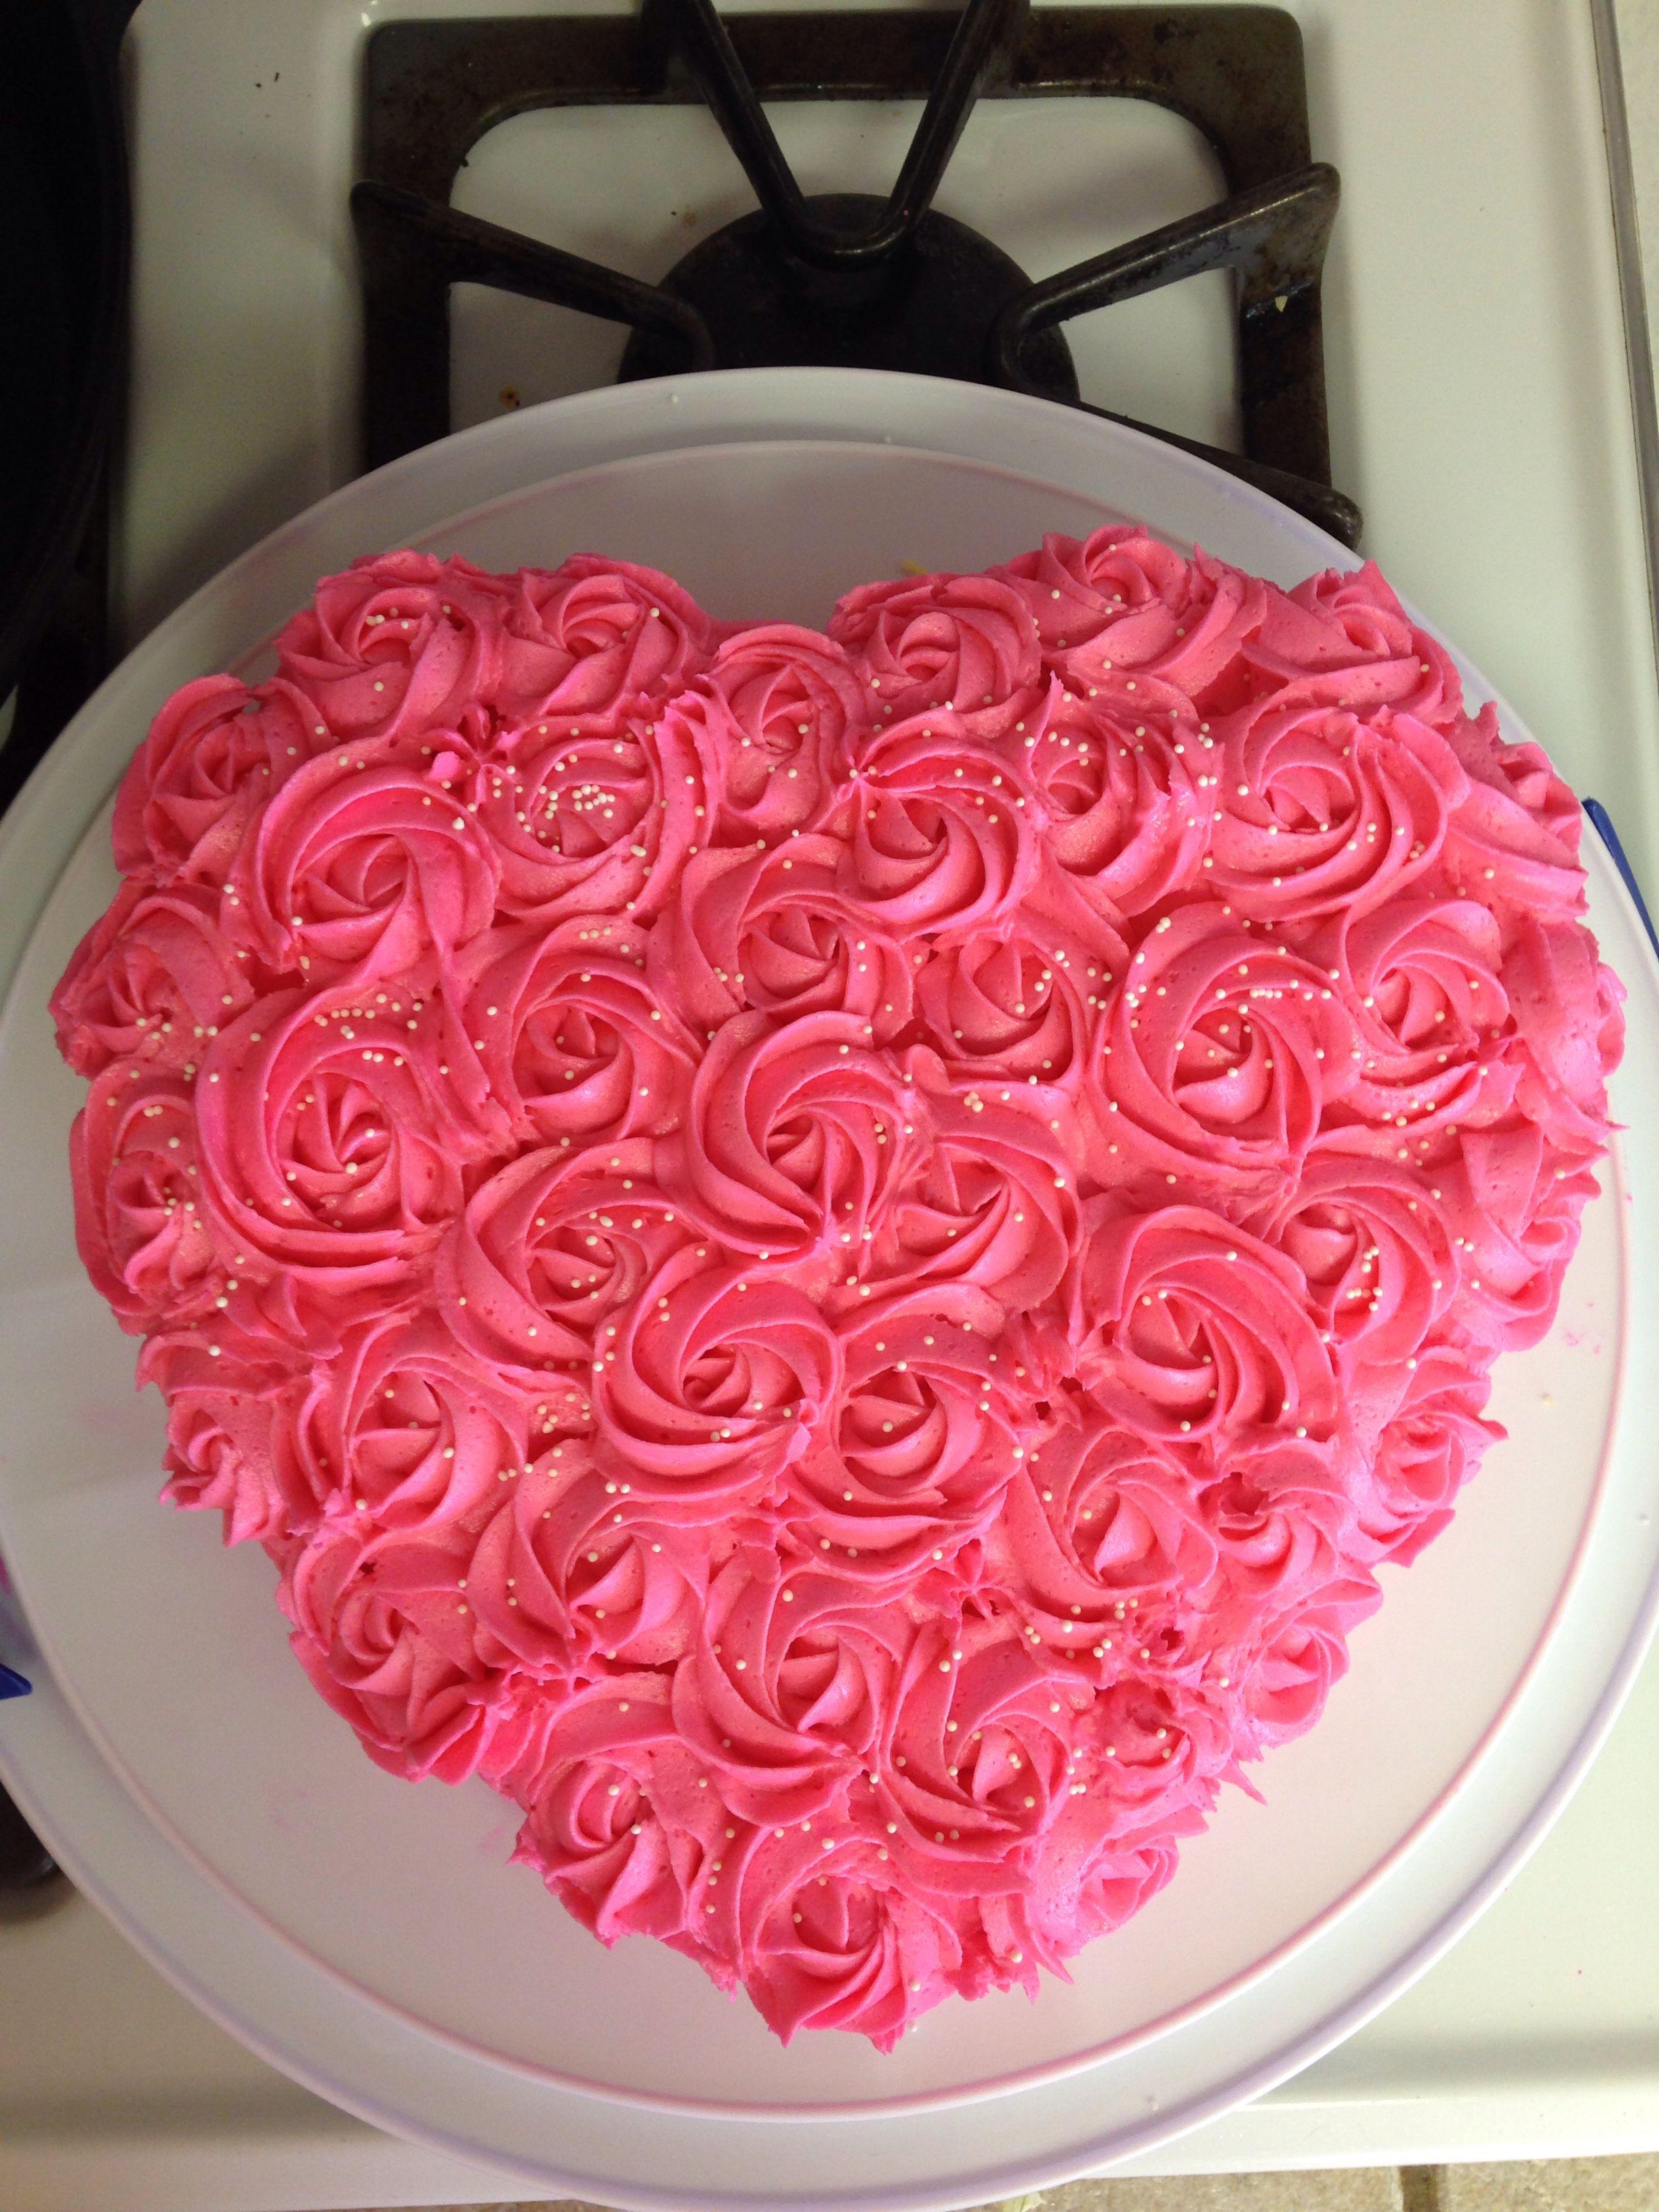 heart shaped rosette cake cake ideas rosette cake. Black Bedroom Furniture Sets. Home Design Ideas